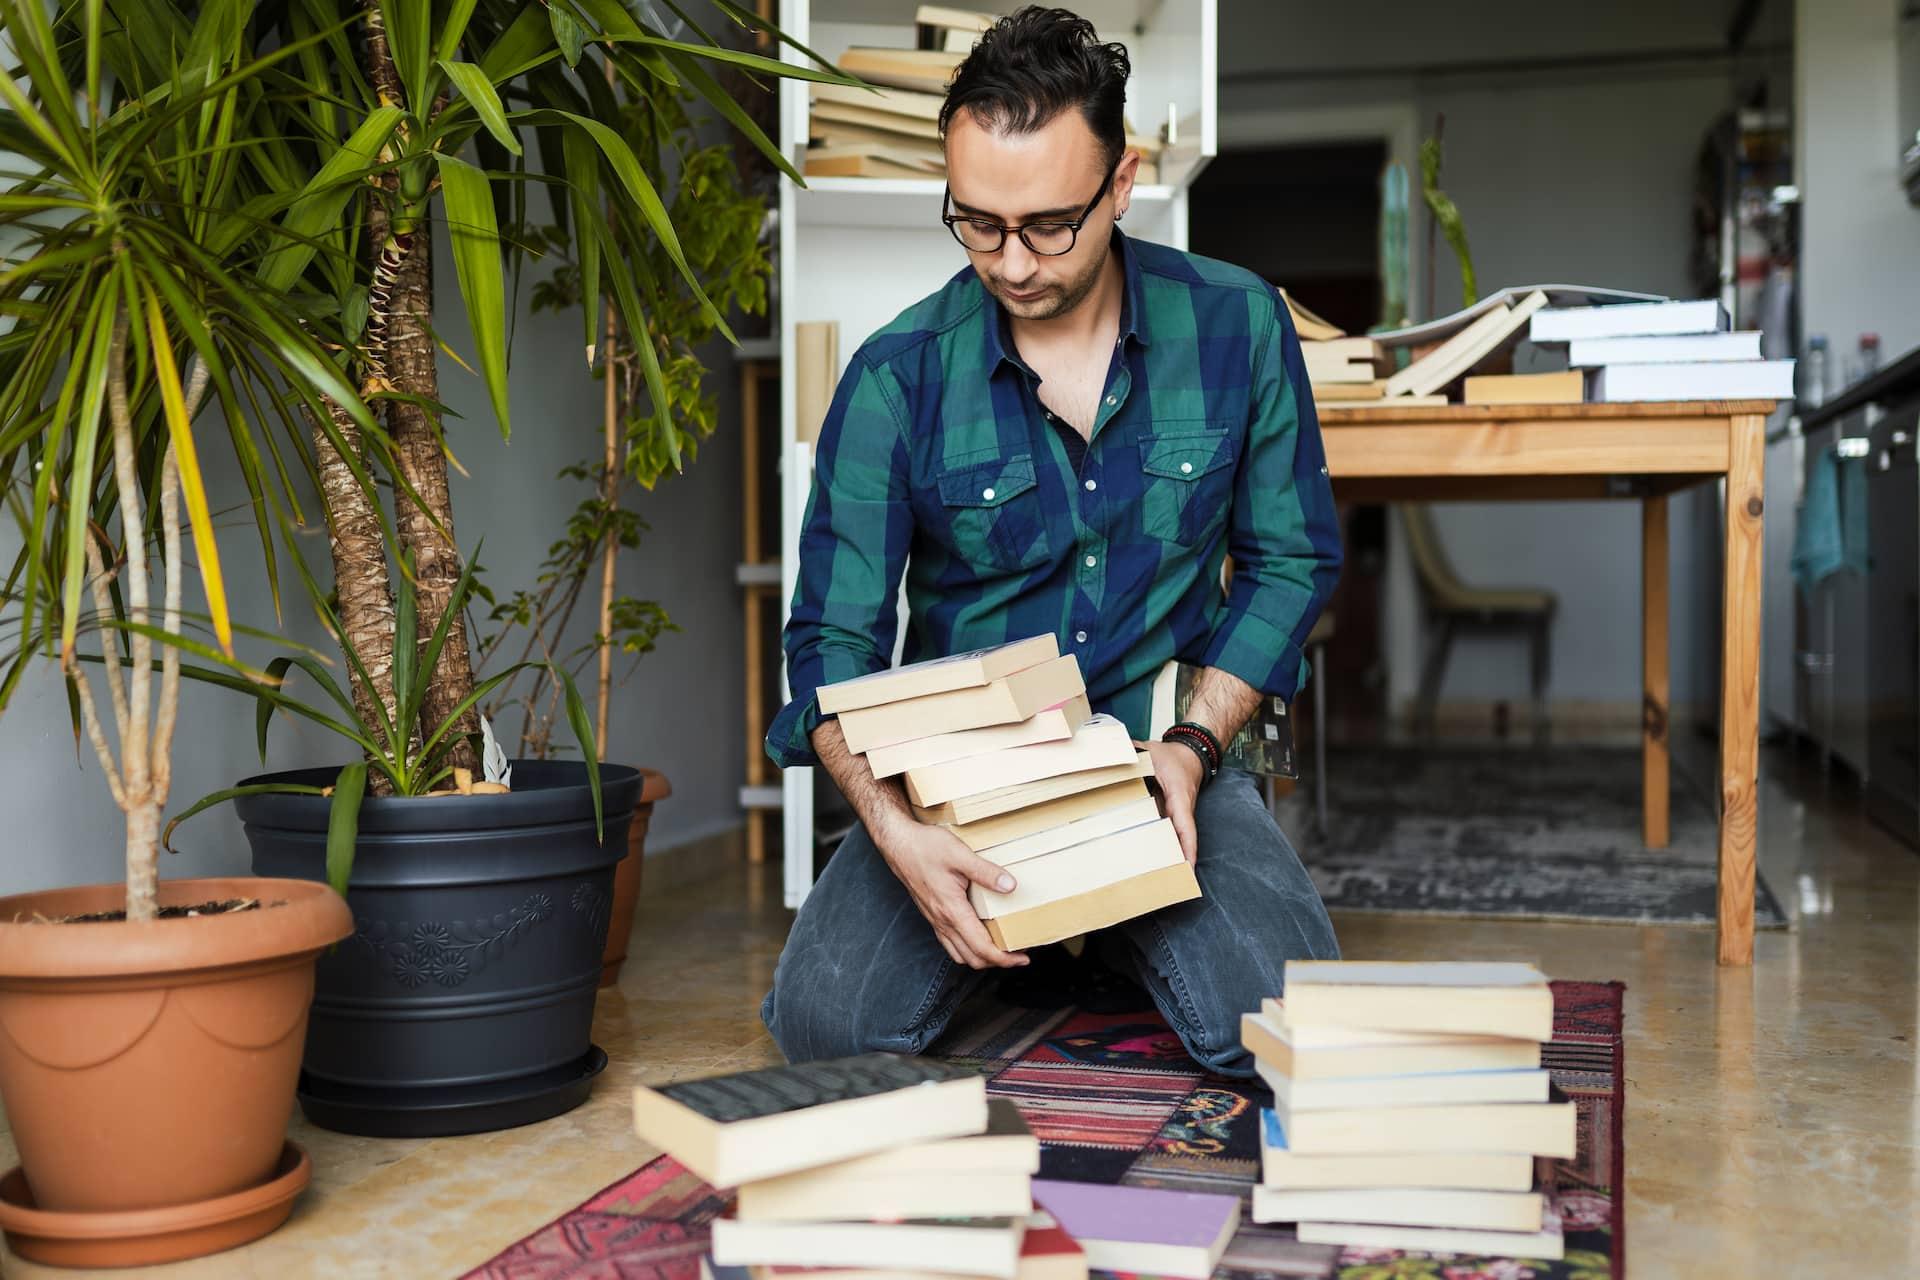 man dropping books